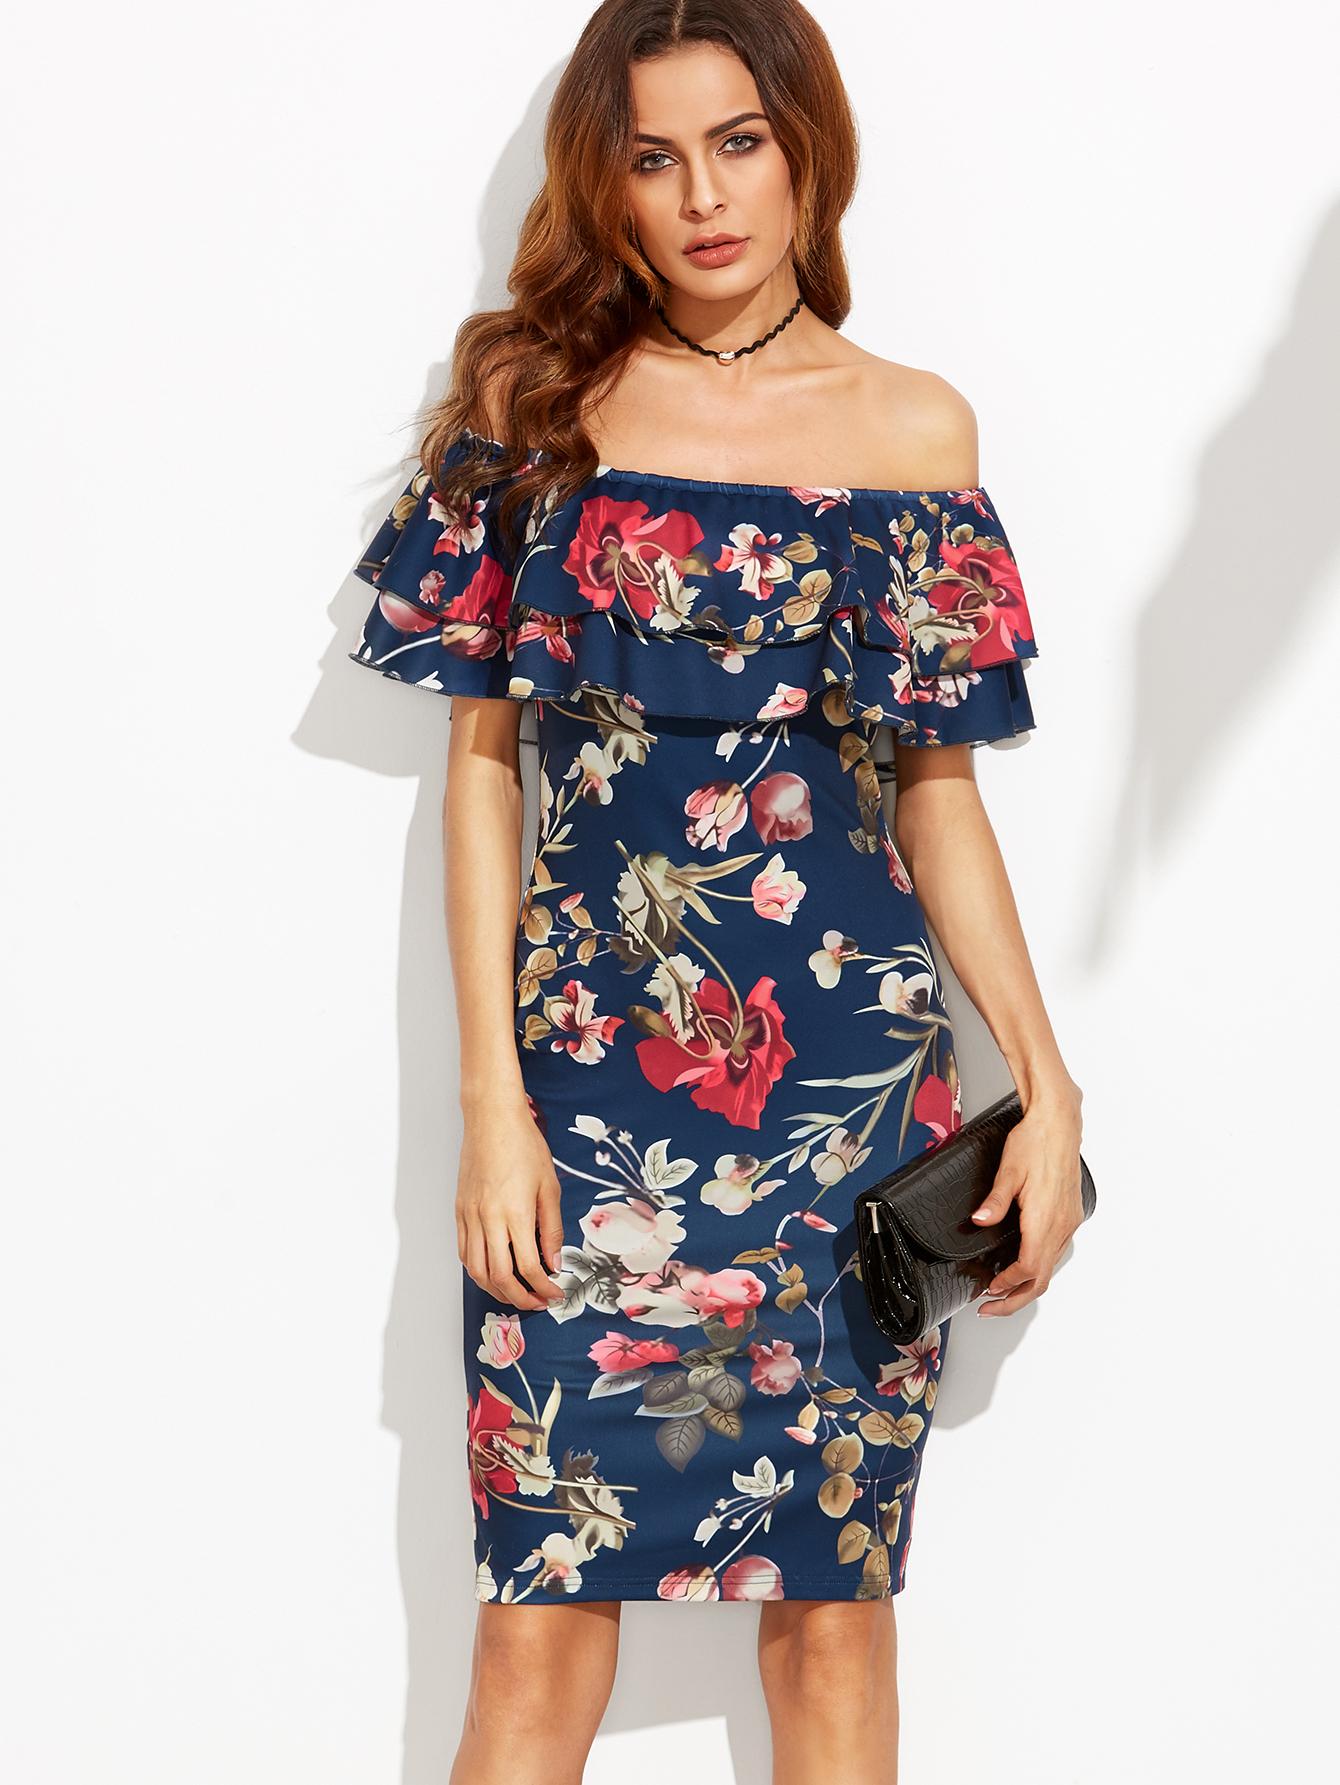 210c368479 Floral Print Off The Shoulder Ruffle Sheath Dress -SheIn(Sheinside)